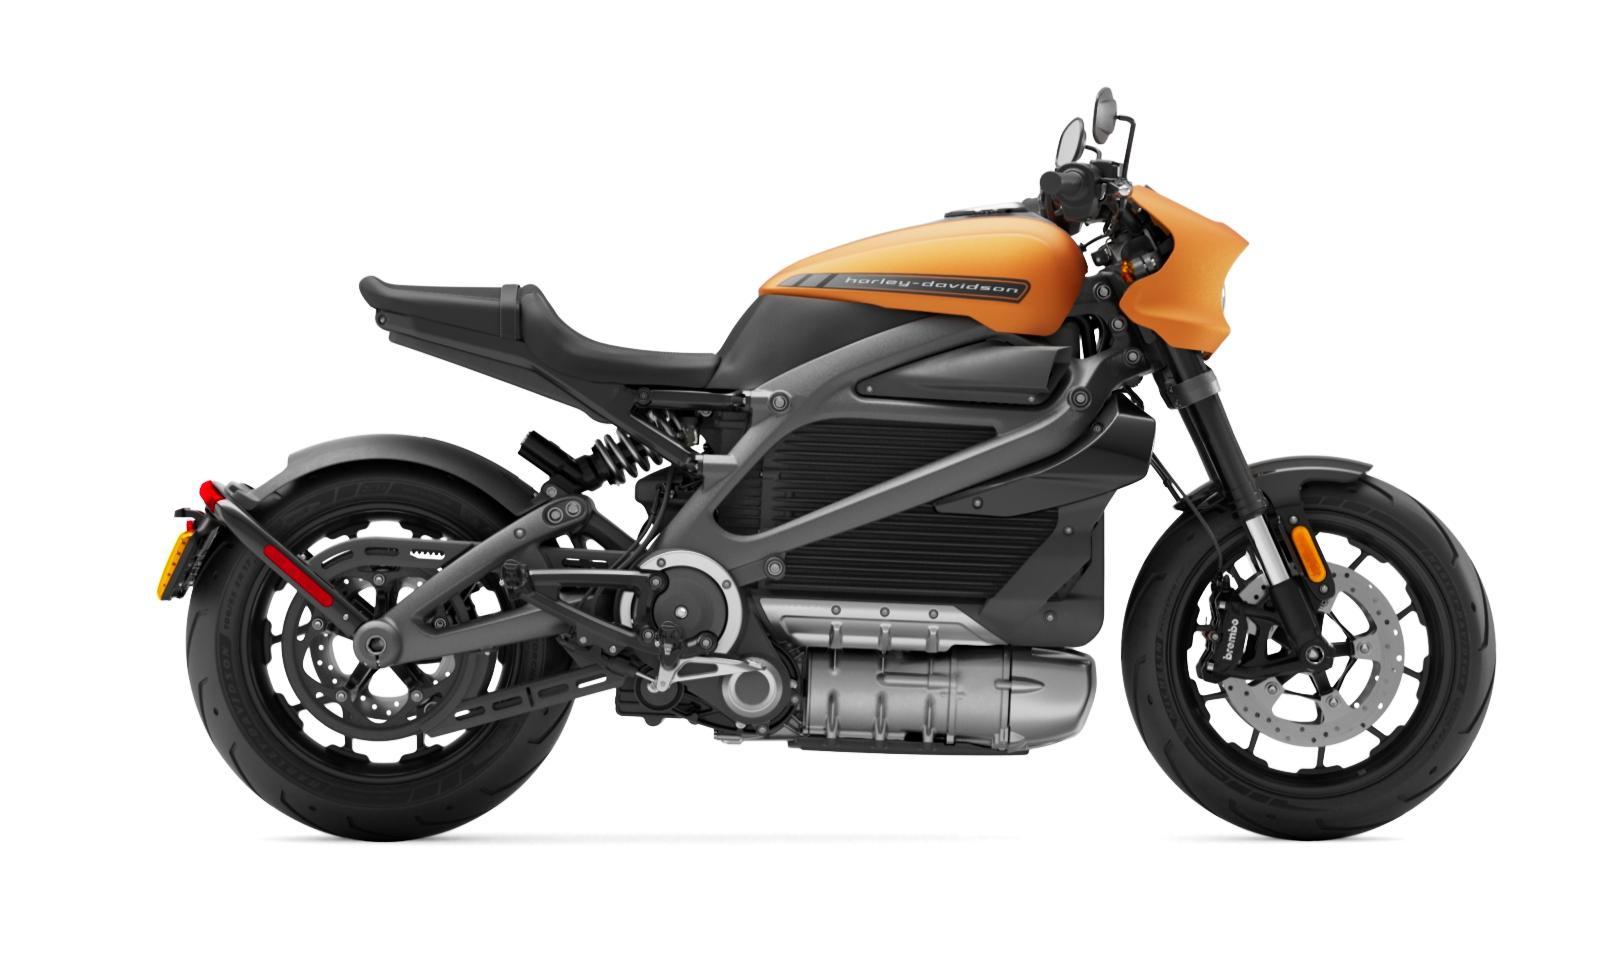 Livewire Electric Motorbike Harley Davidson Uk